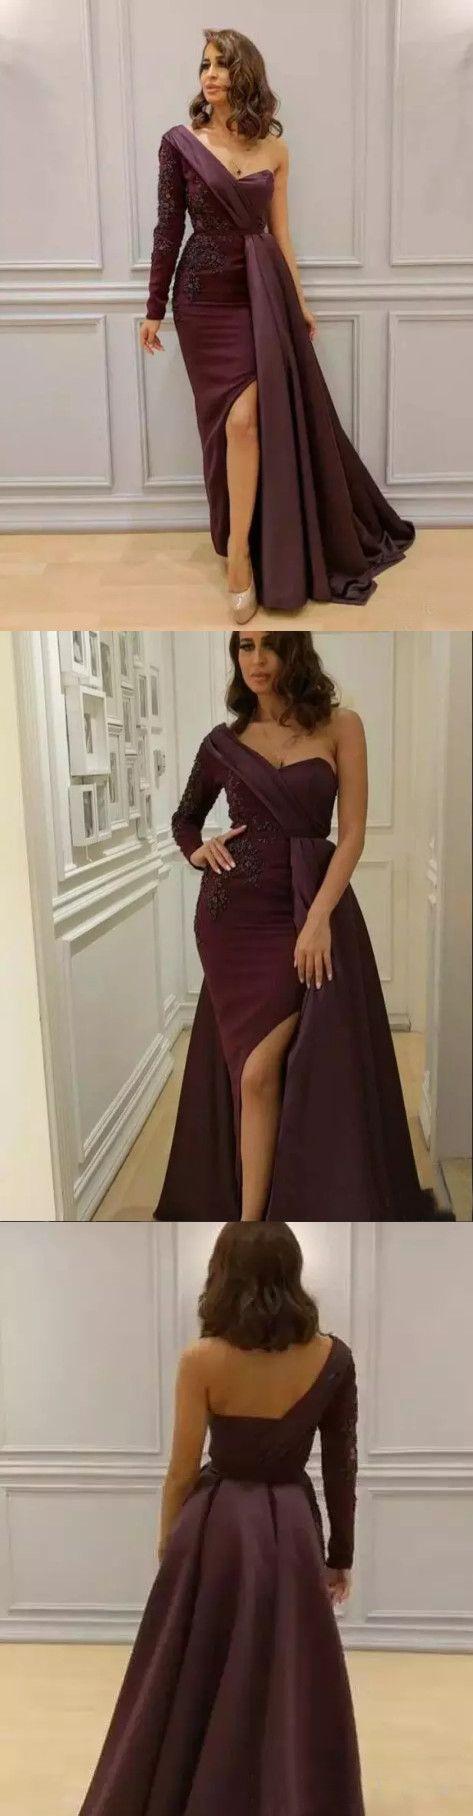 chic one shoulder prom dresses long sleeve burgundy long prom